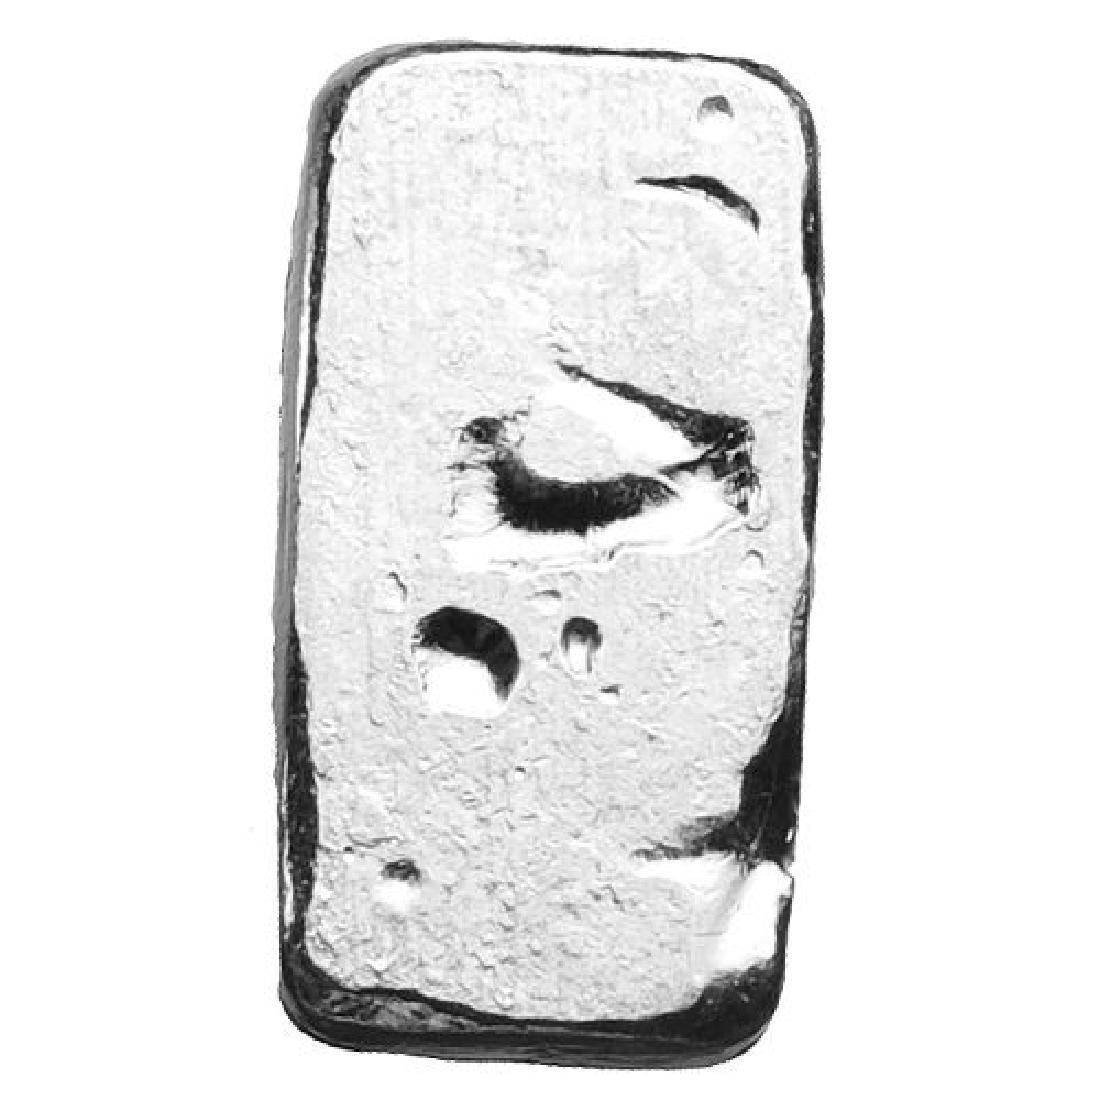 1 oz Silver Crossbones - Poured Silver - .999 - 2